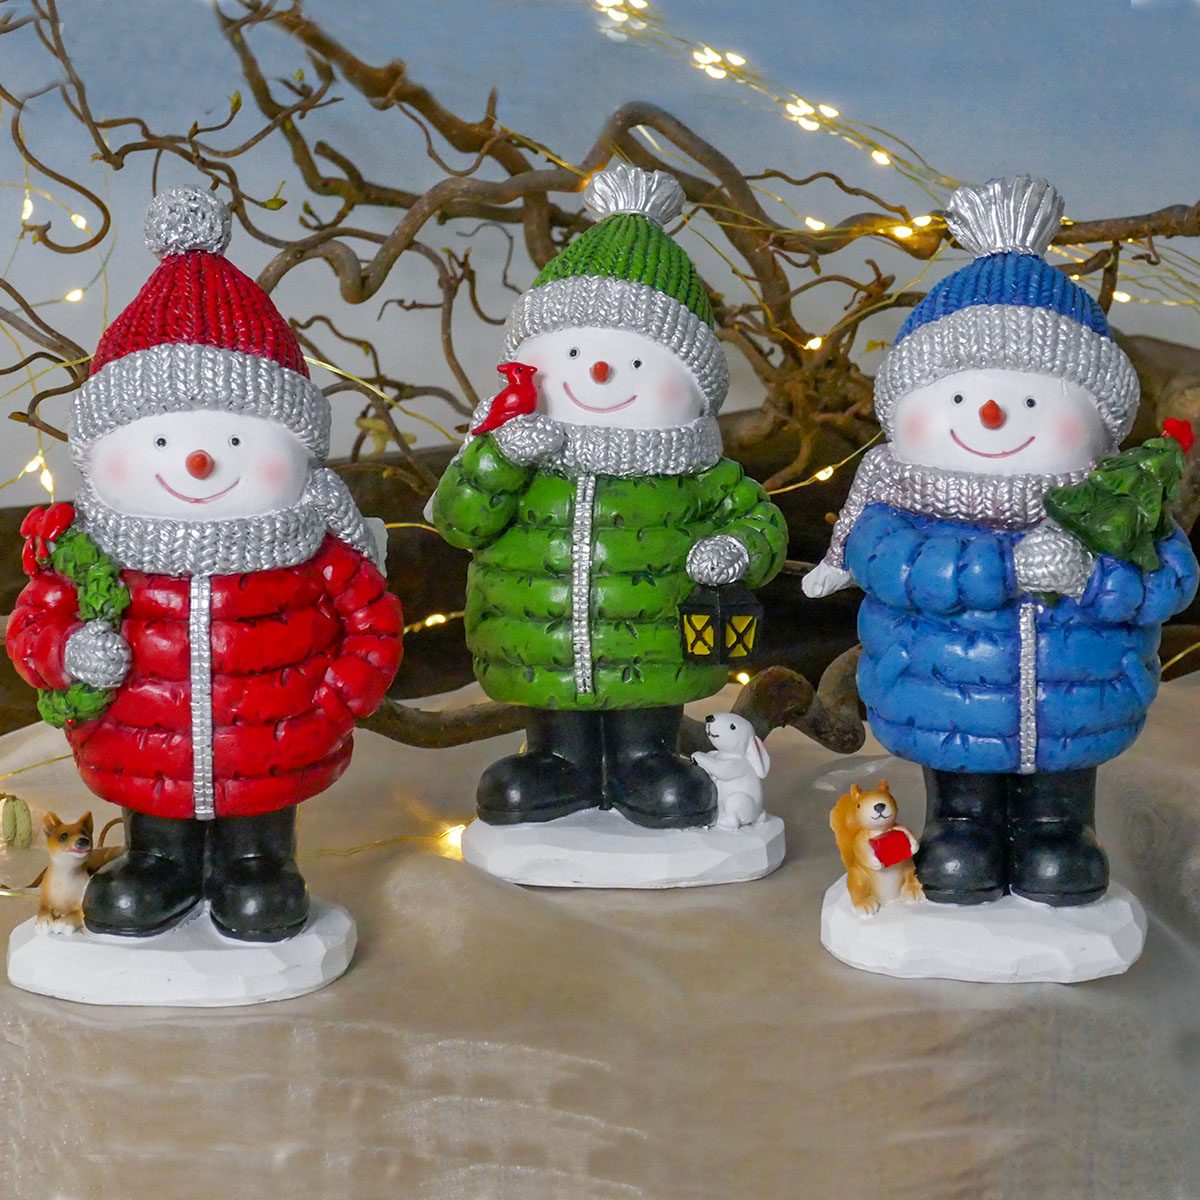 Farbenfrohe Schneemänner im Winter-Outfit Image